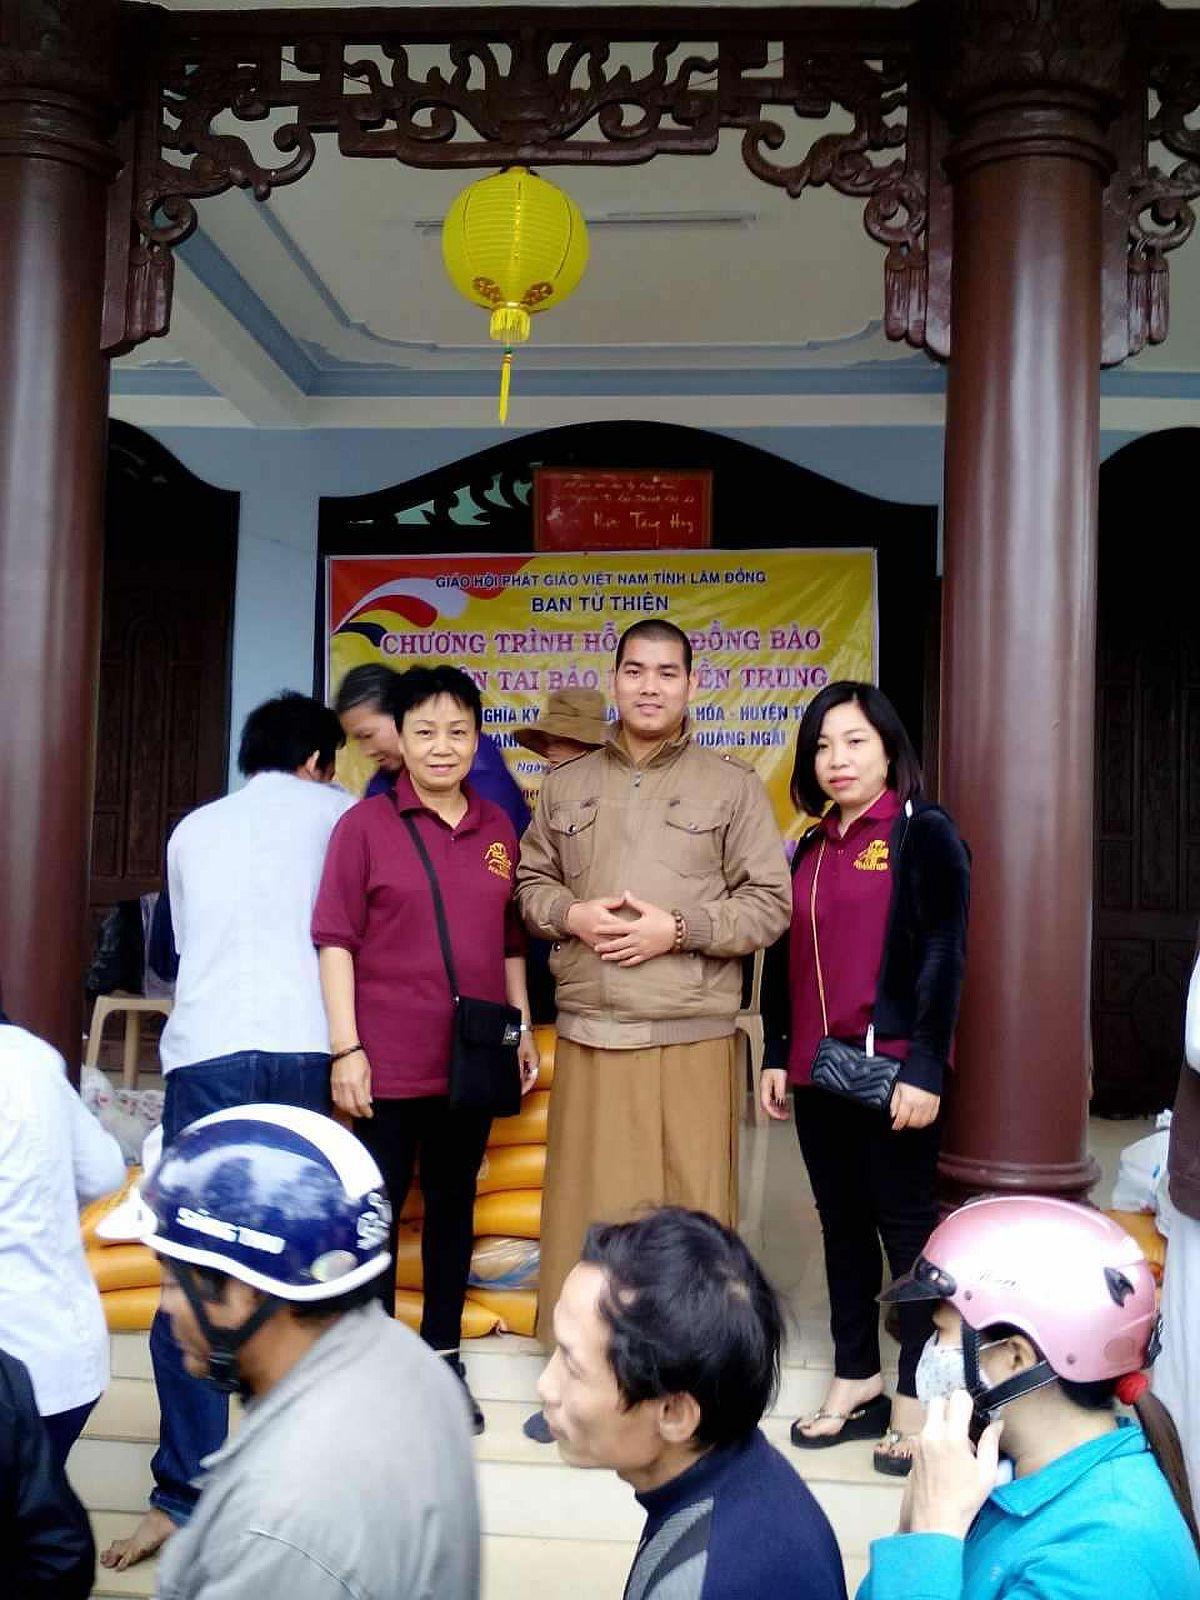 tang qua Quang ngai 2 (45)